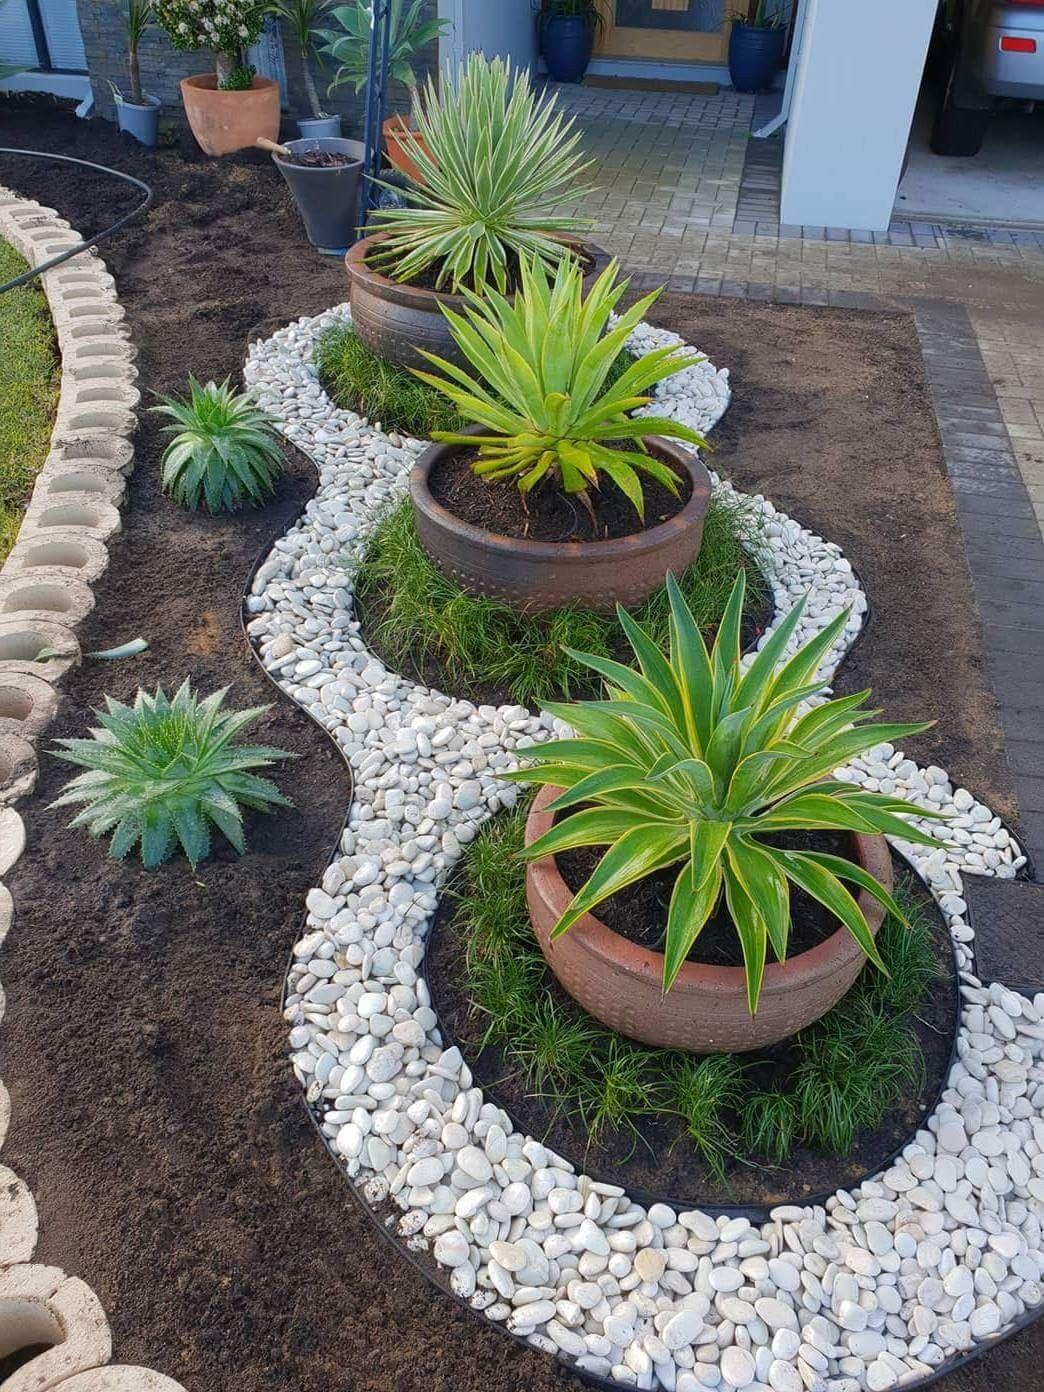 Garden and Gardening Project Ideas Garden Decor Project